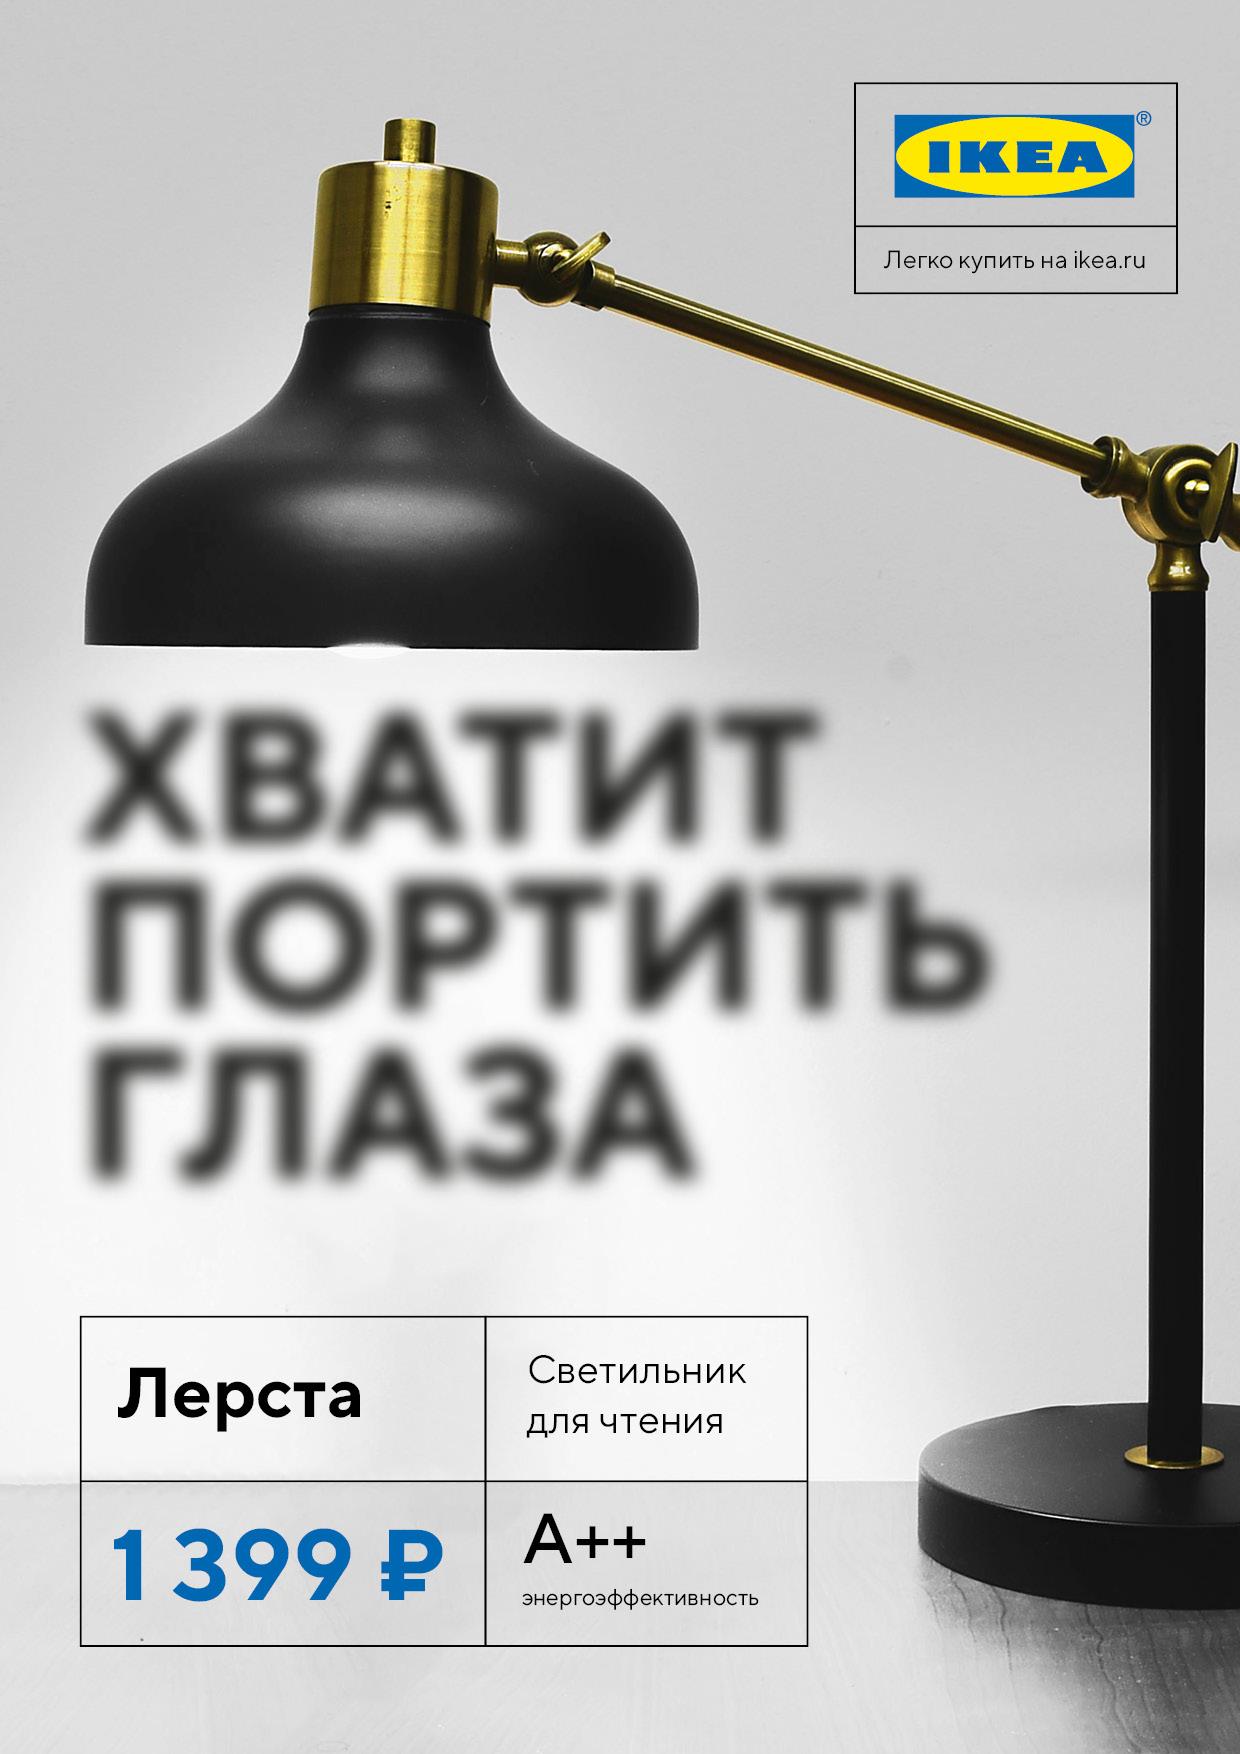 Рекламный постер (тейбл-тент) для Ikea